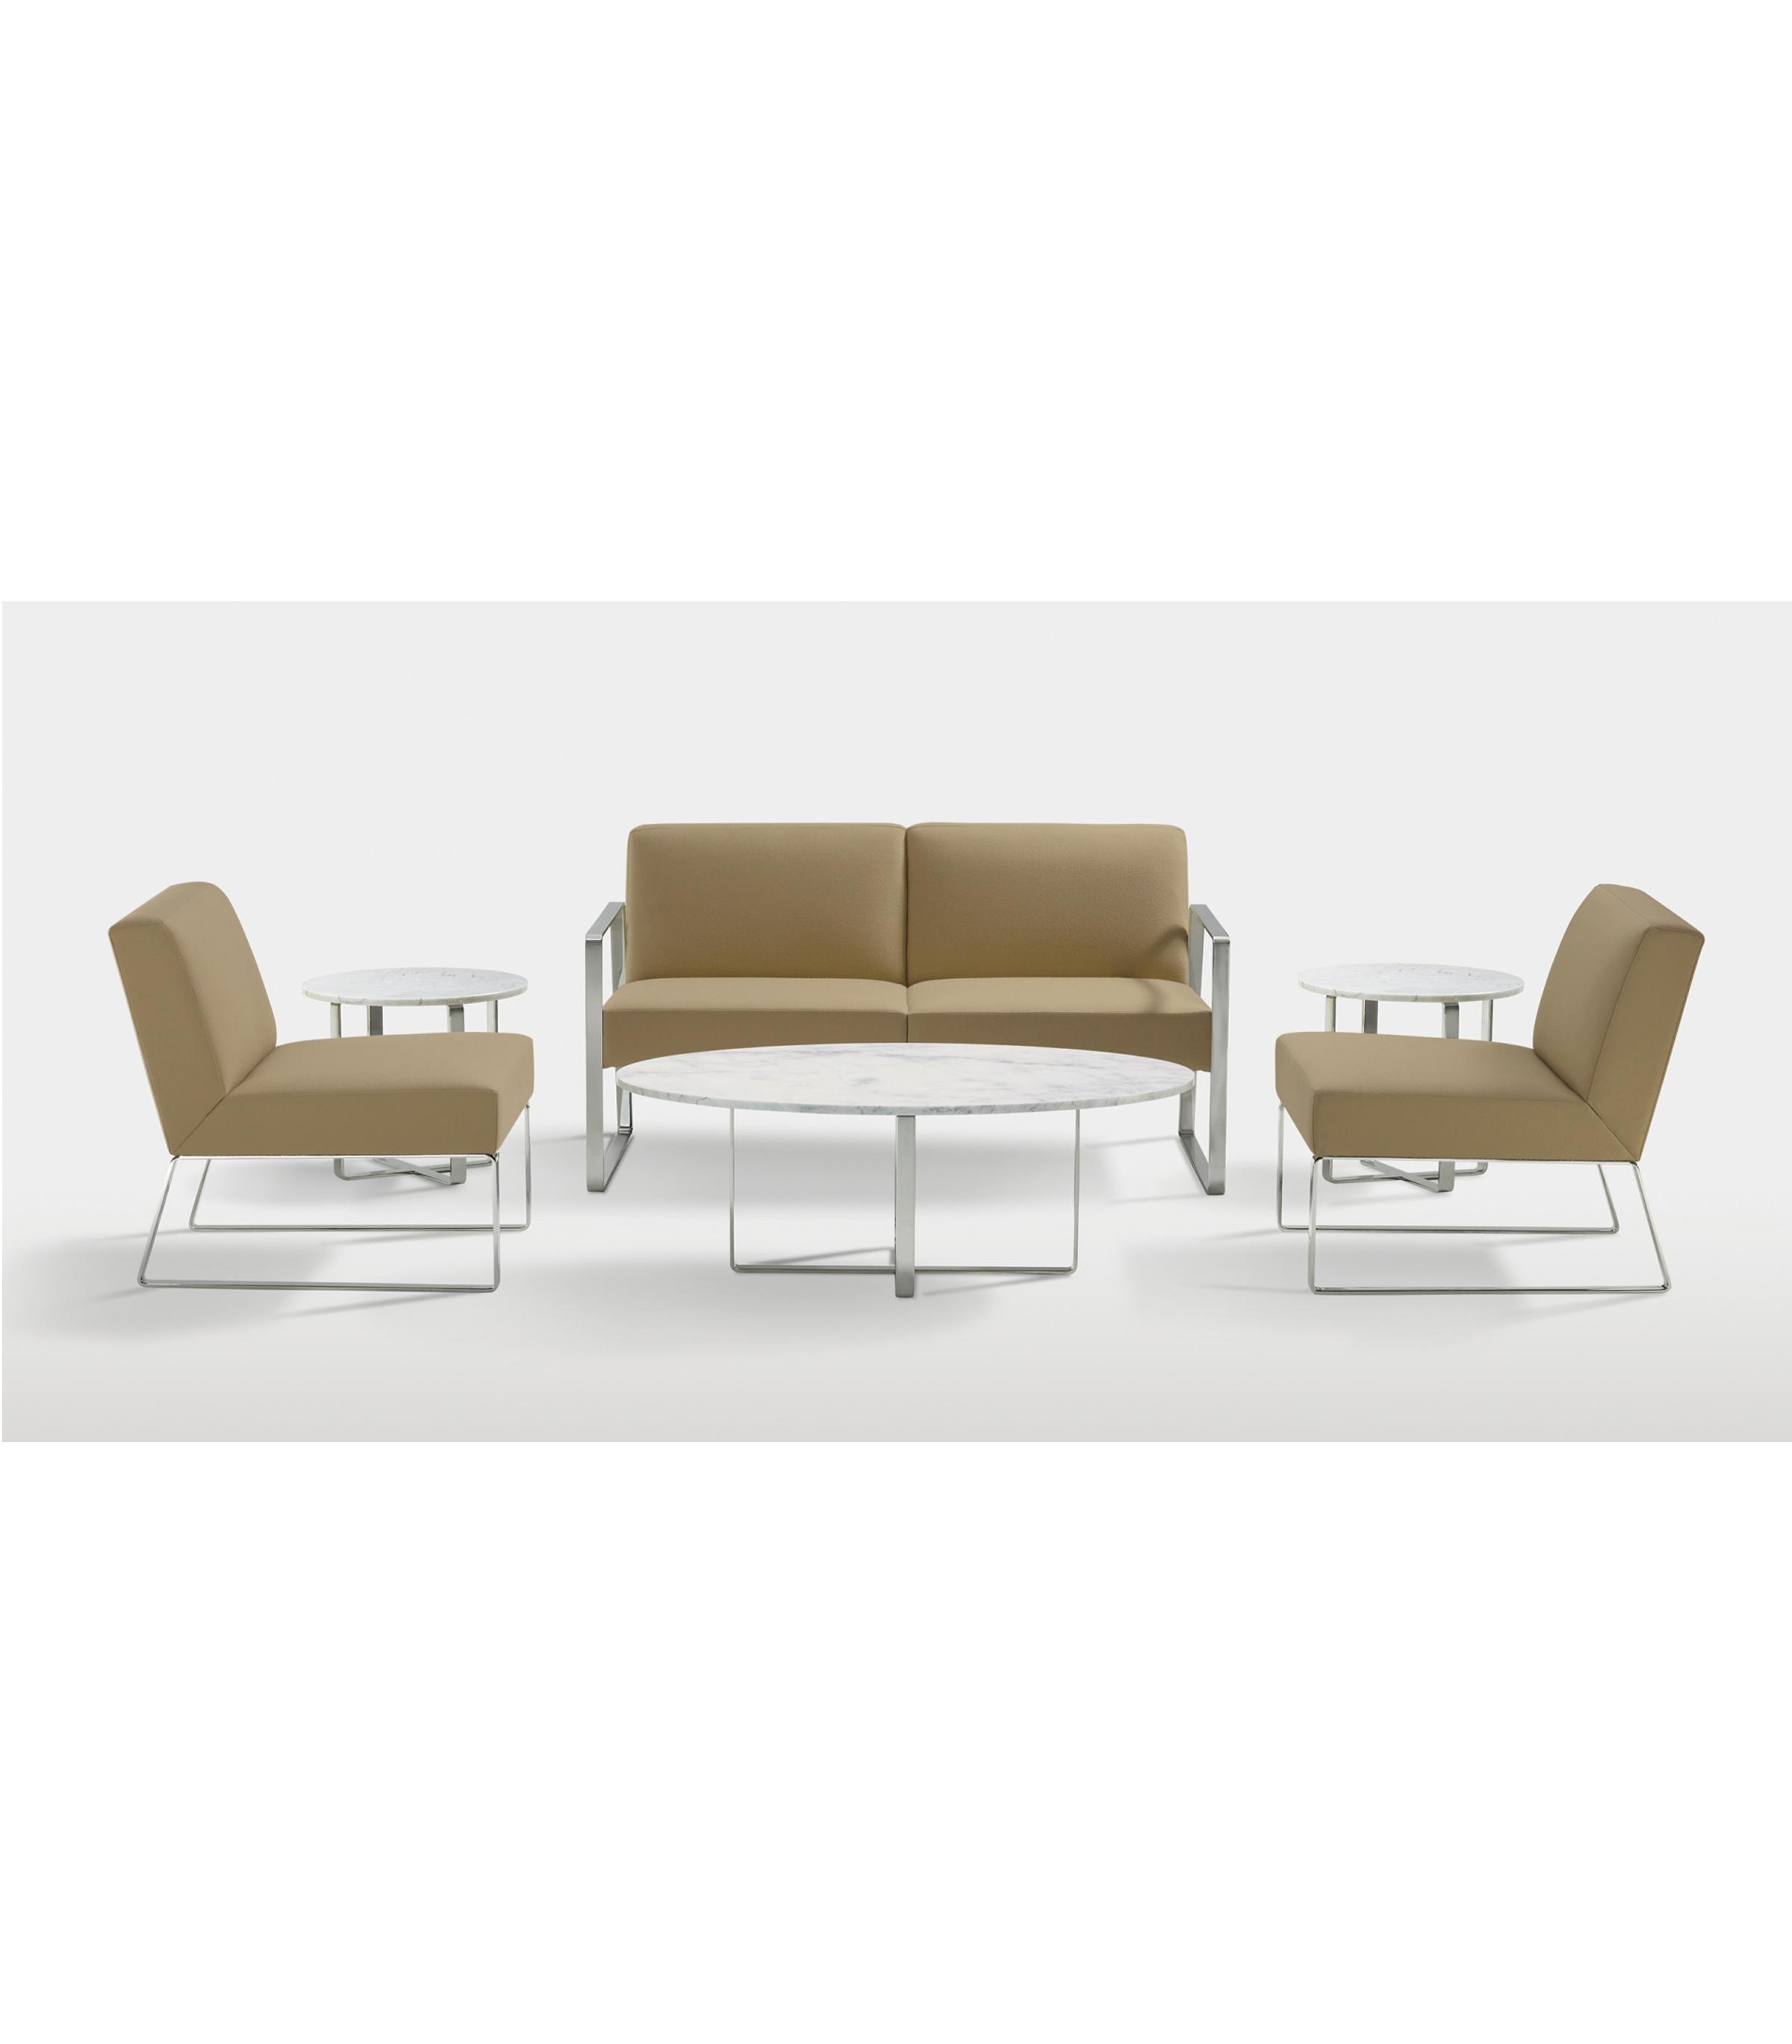 Serif Lounge